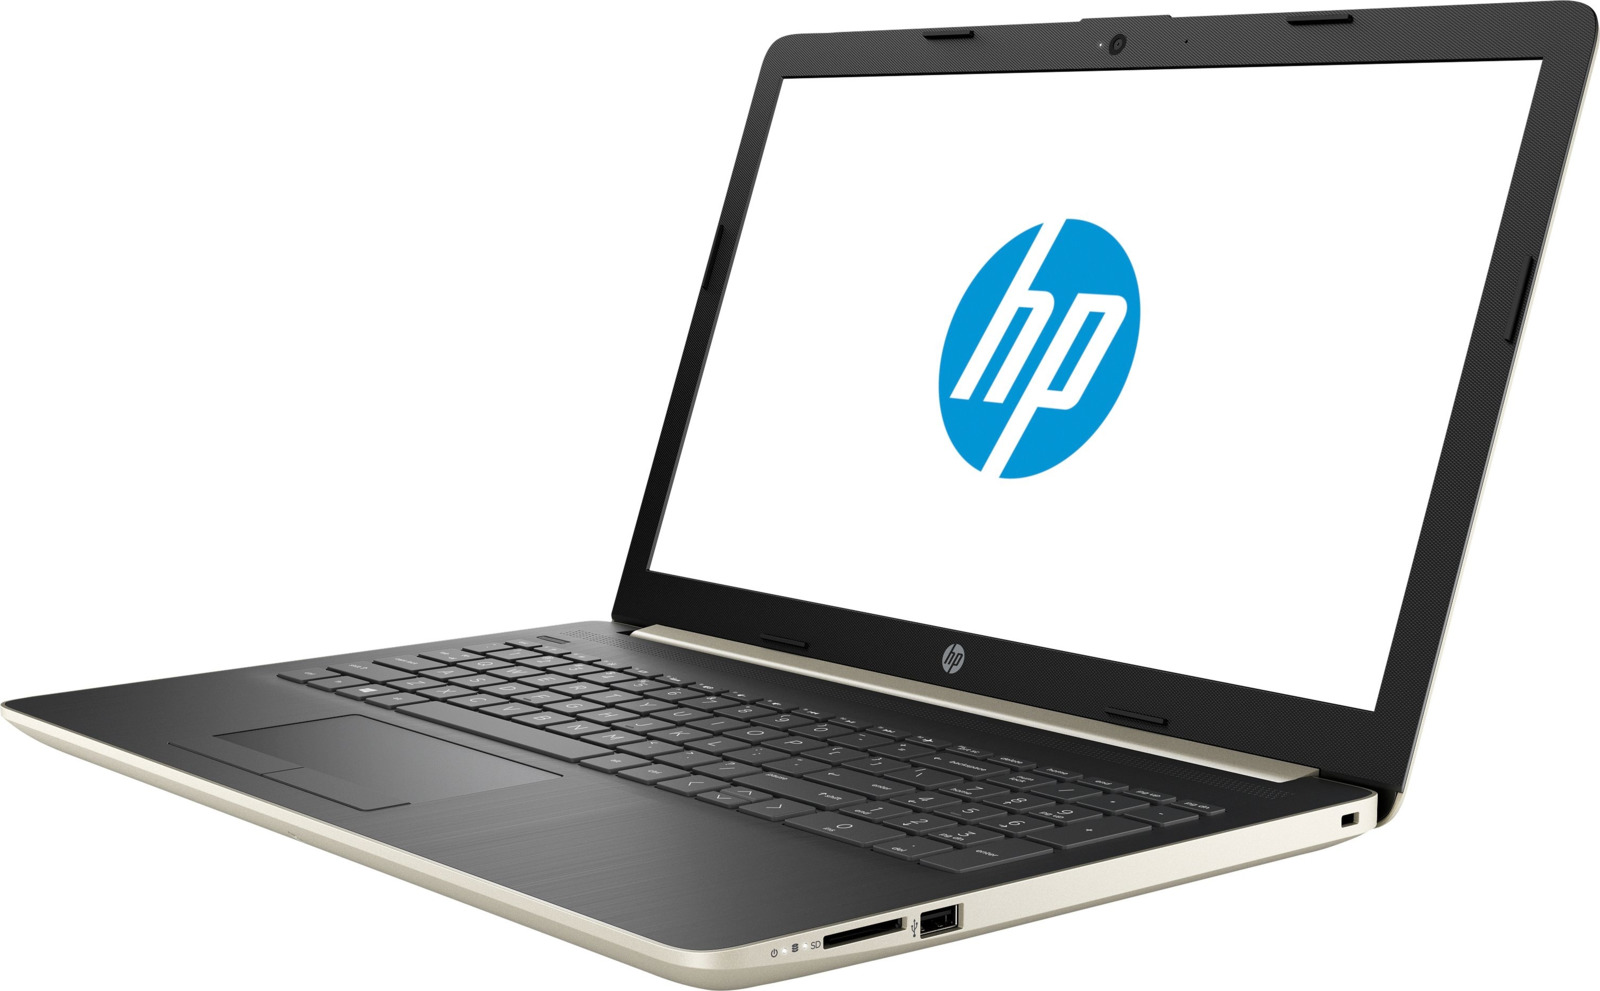 15.6 Ноутбук HP 15-db0074ur 4JV08EA, золотой ноутбук цена качество